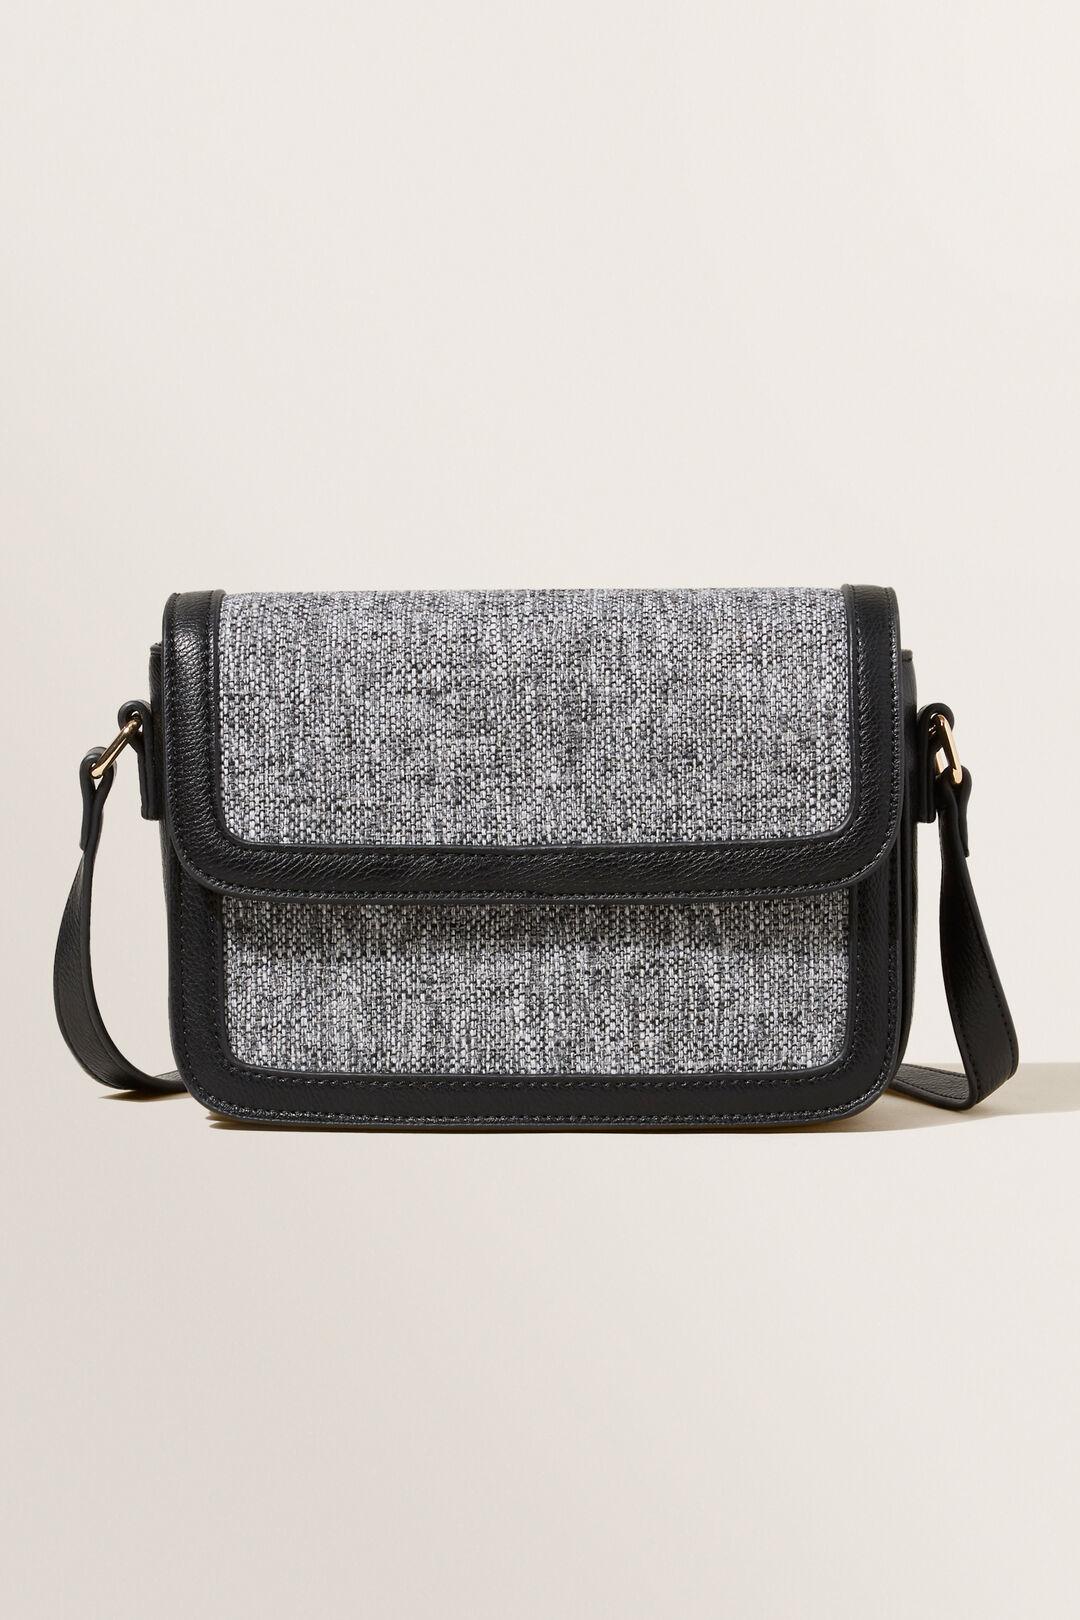 Lola Cross Body Bag  Black Multi  hi-res